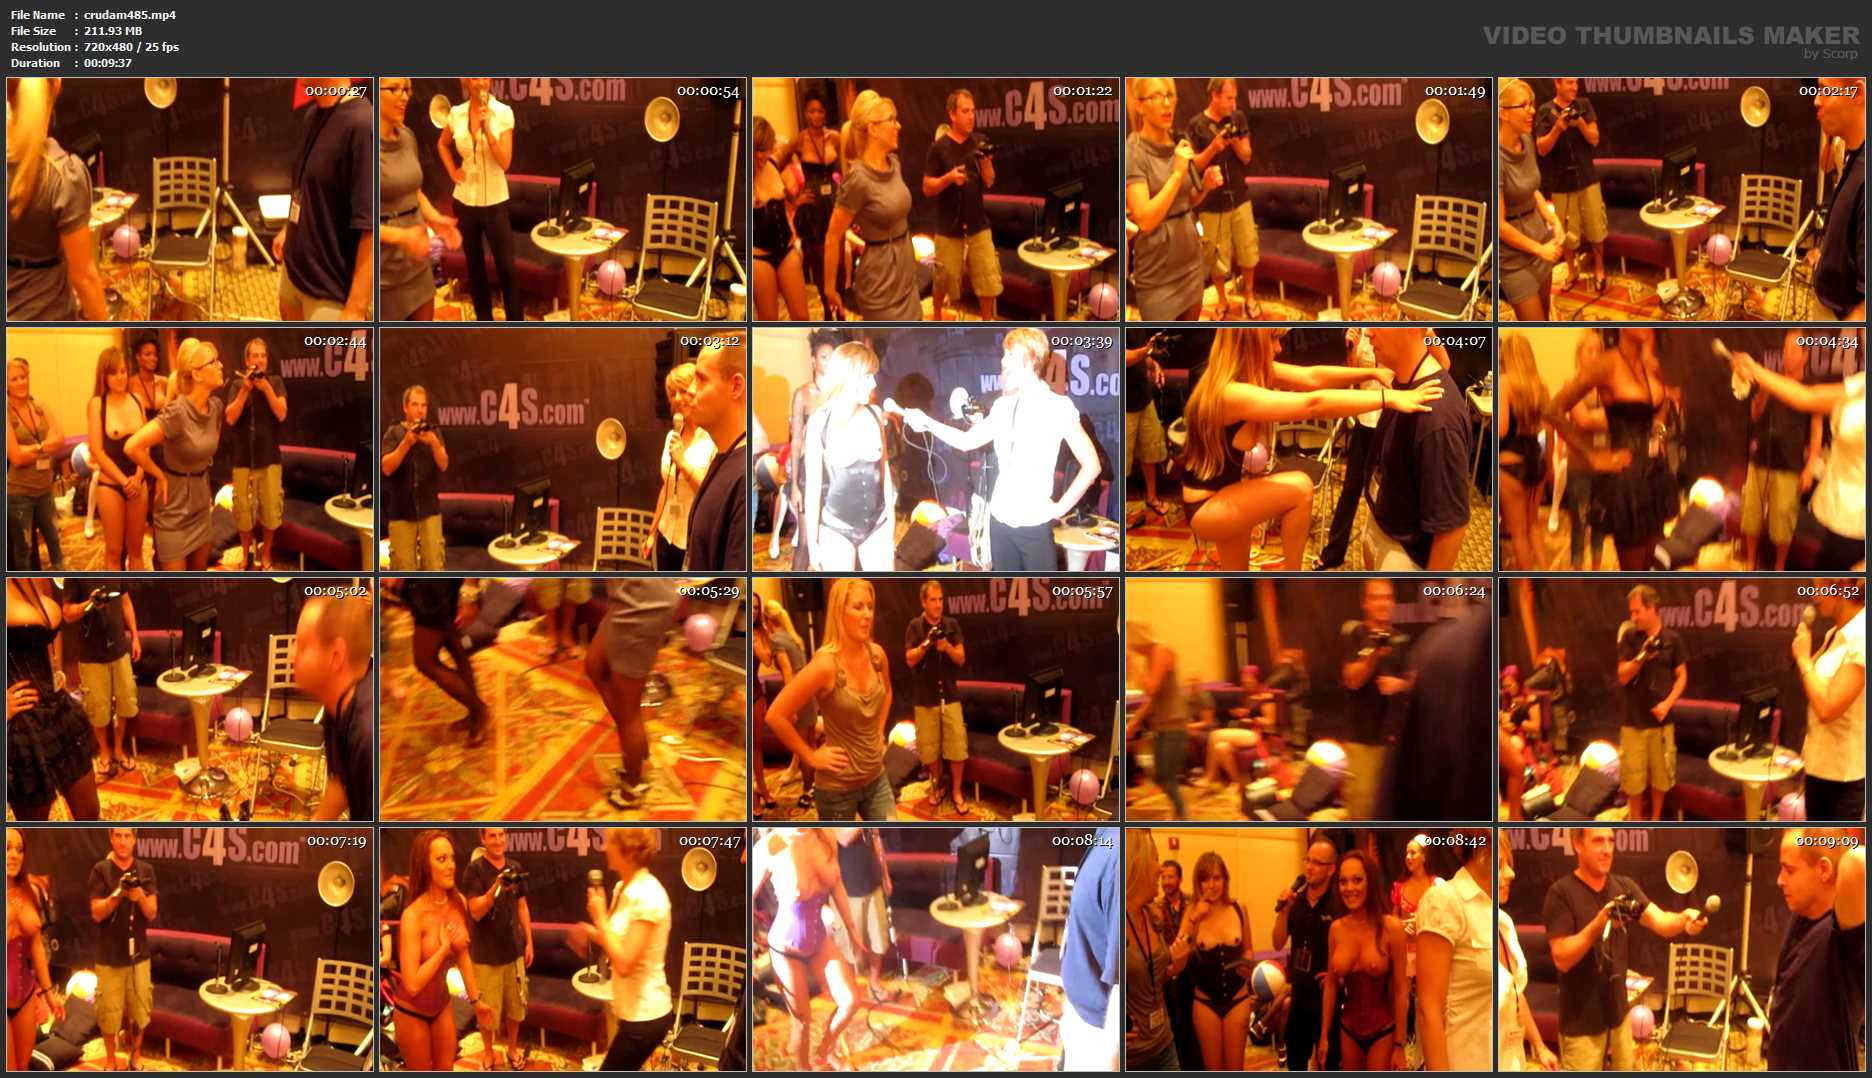 FetishCon 2010 Ballbusting Demonstration - CRUDELIS AMATOR BALLBUSTING FETISH - SD/480p/MP4